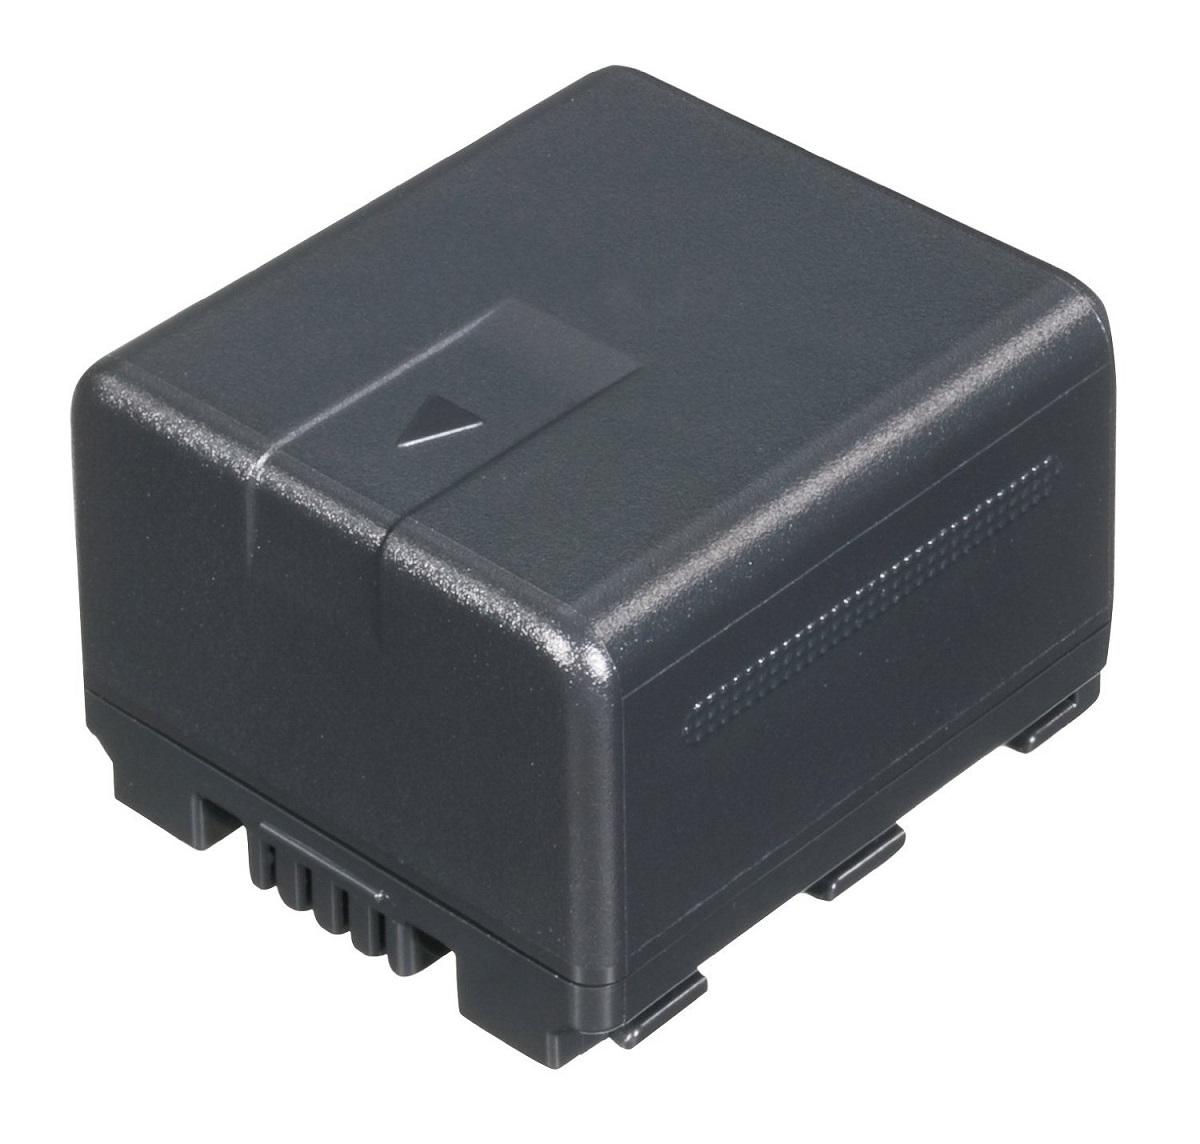 Panasonic パナソニック バッテリーパック  VW-VBN130-K 純正  VWVBN130Kカメラバッテリー 充電池